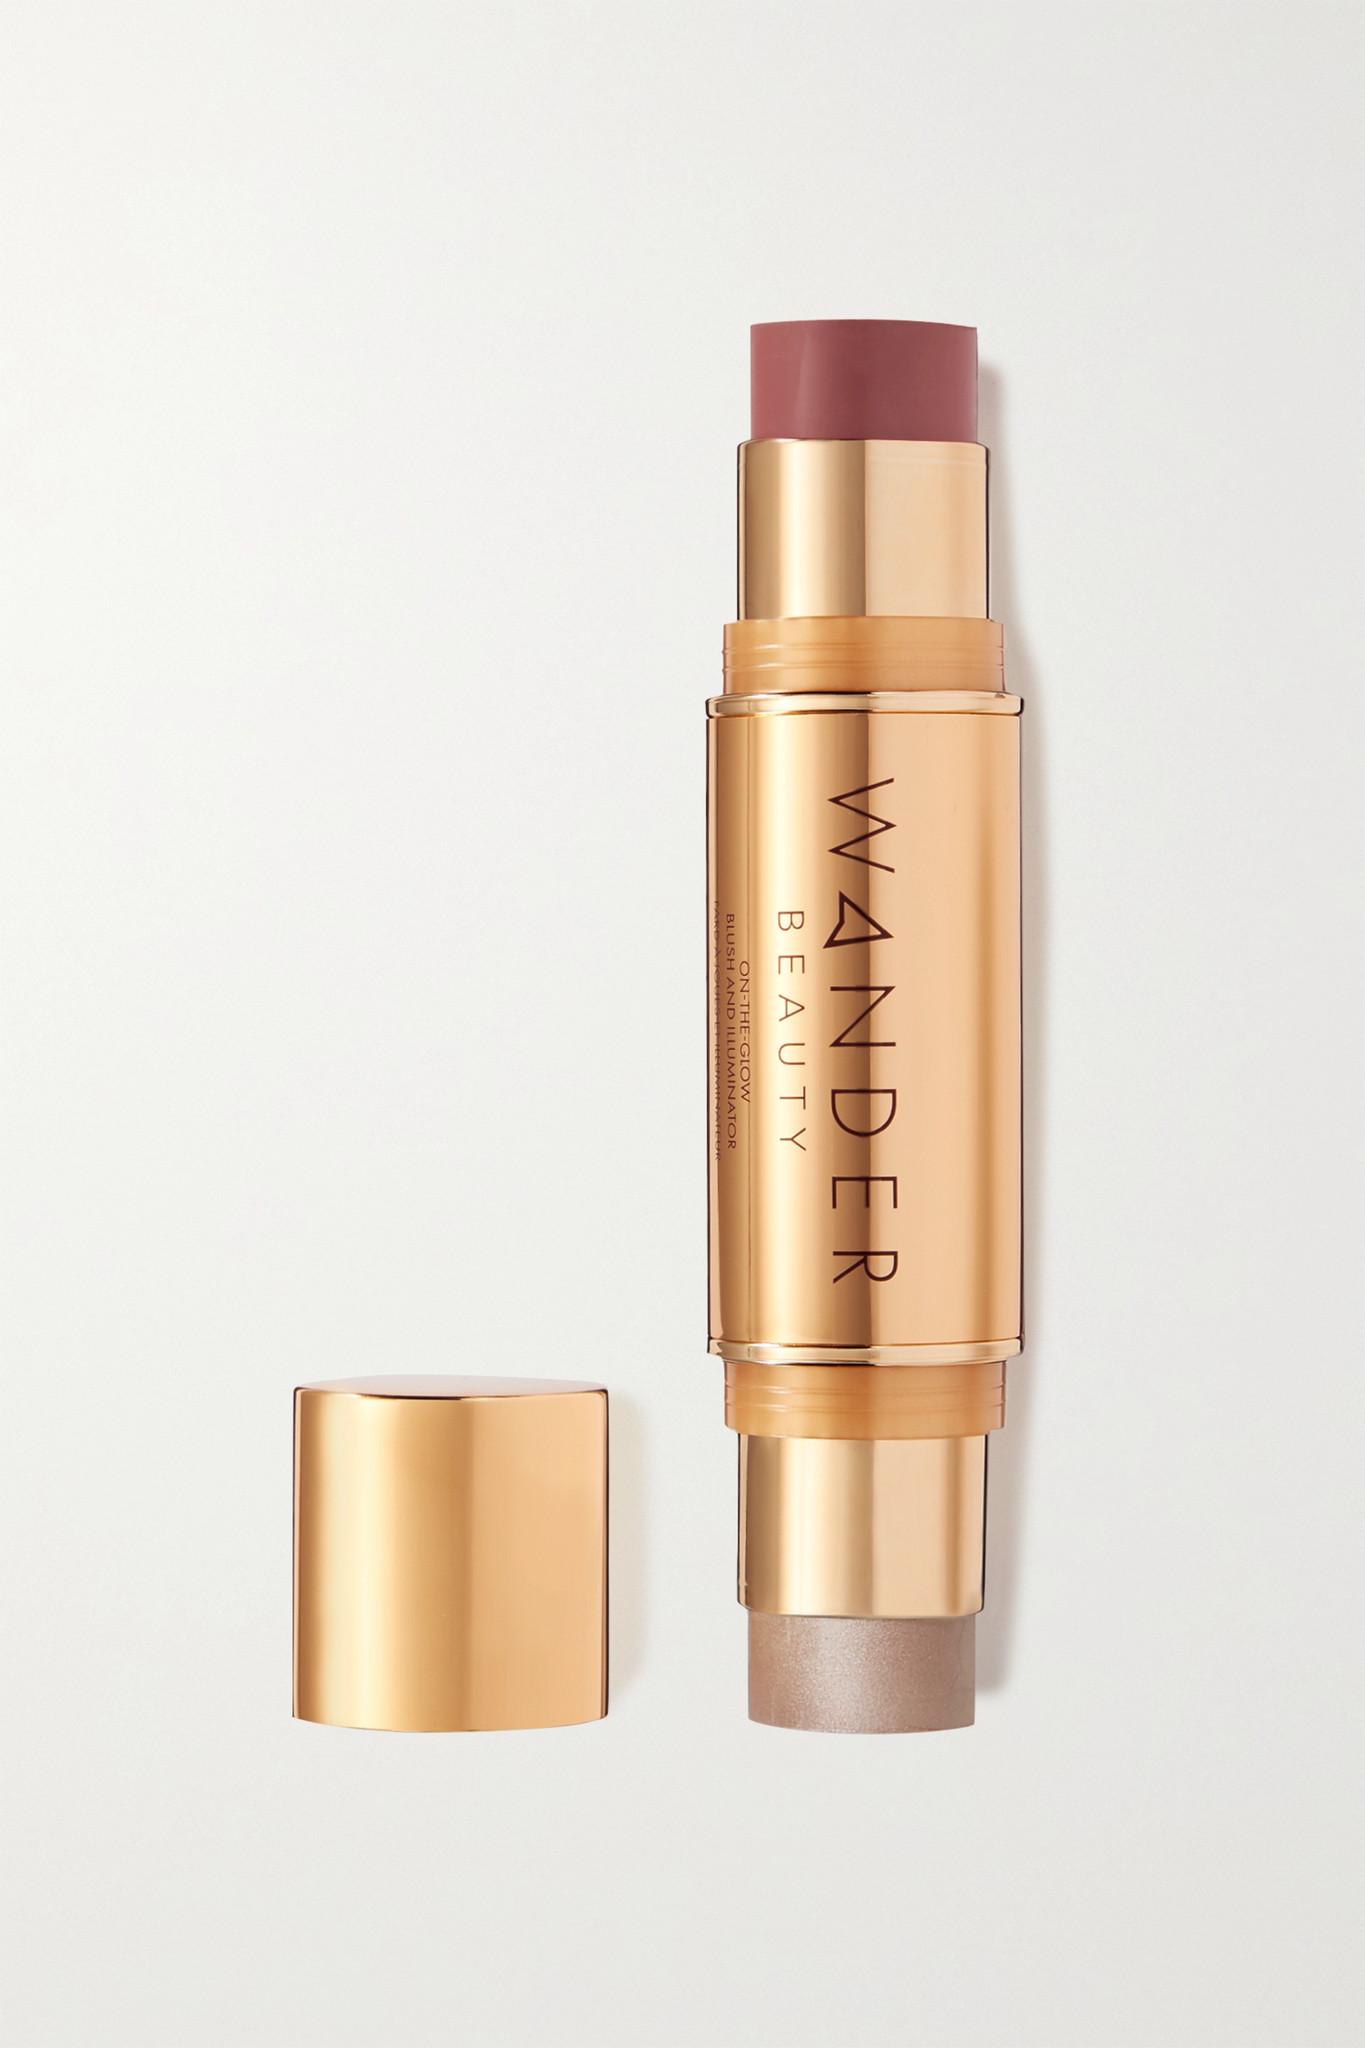 WANDER BEAUTY - On-the-glow Blush And Illuminator - Berry Whisper - Pink - one size